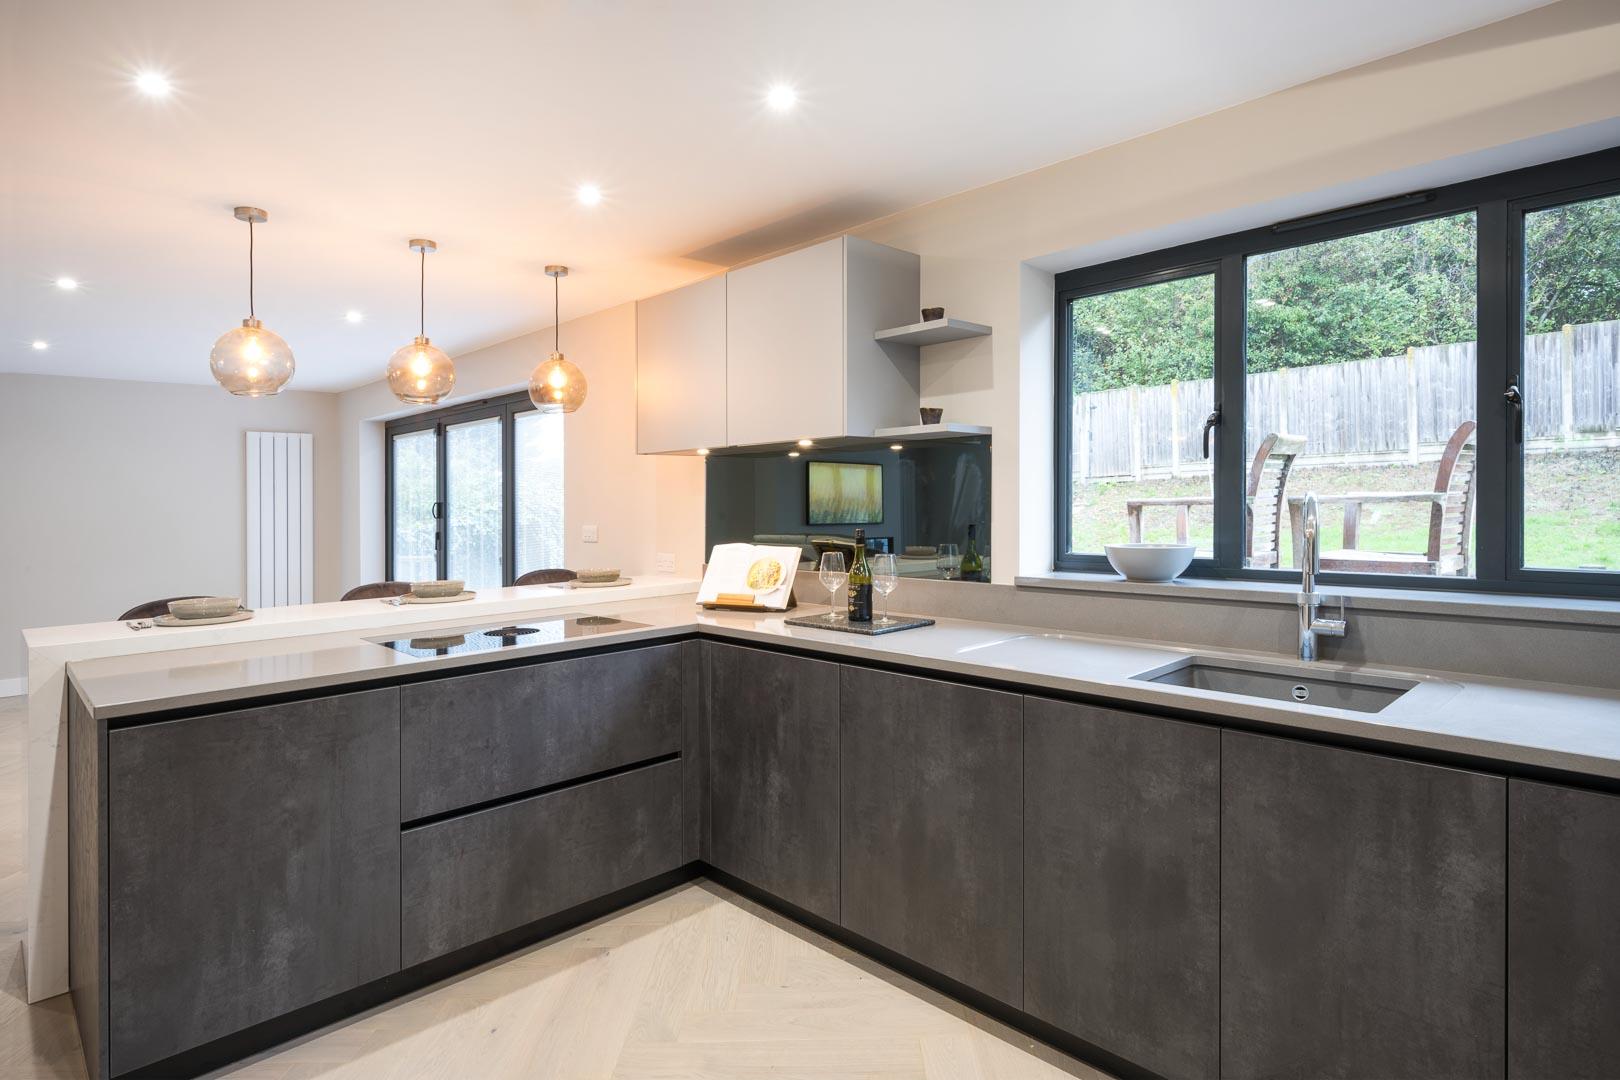 two tone kitchen in grey